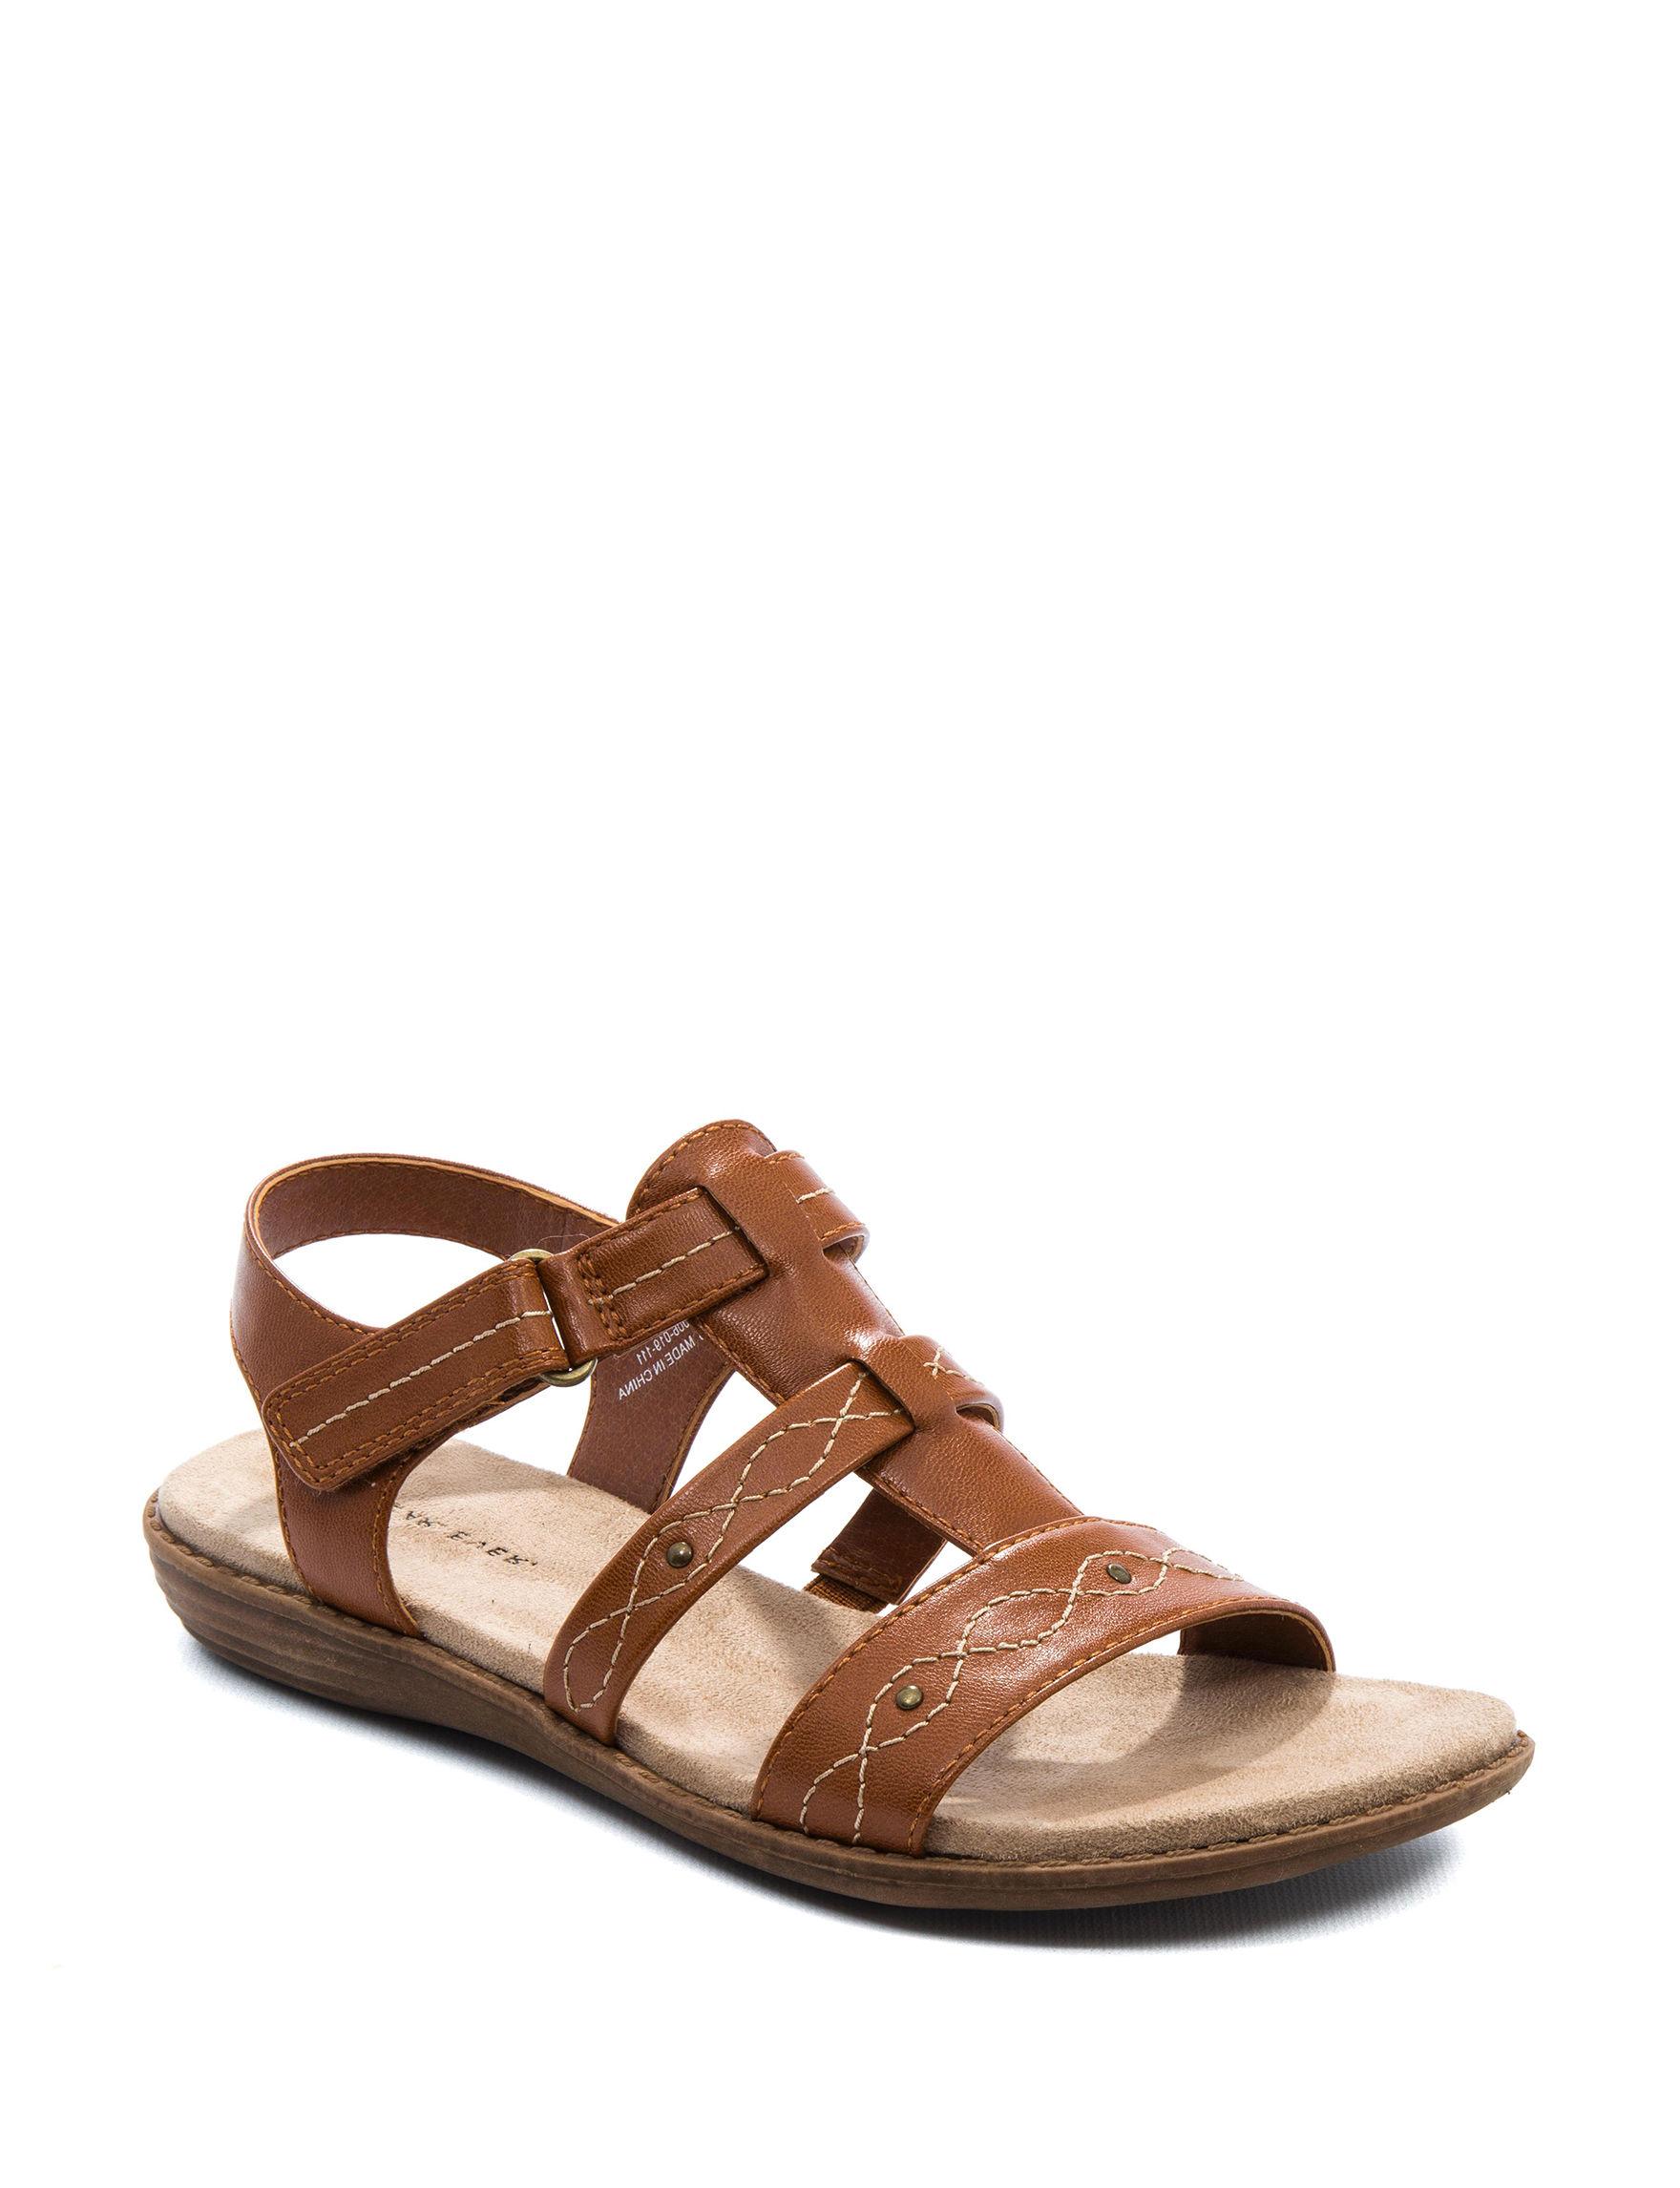 Wear. Ever. Brown Flat Sandals Comfort